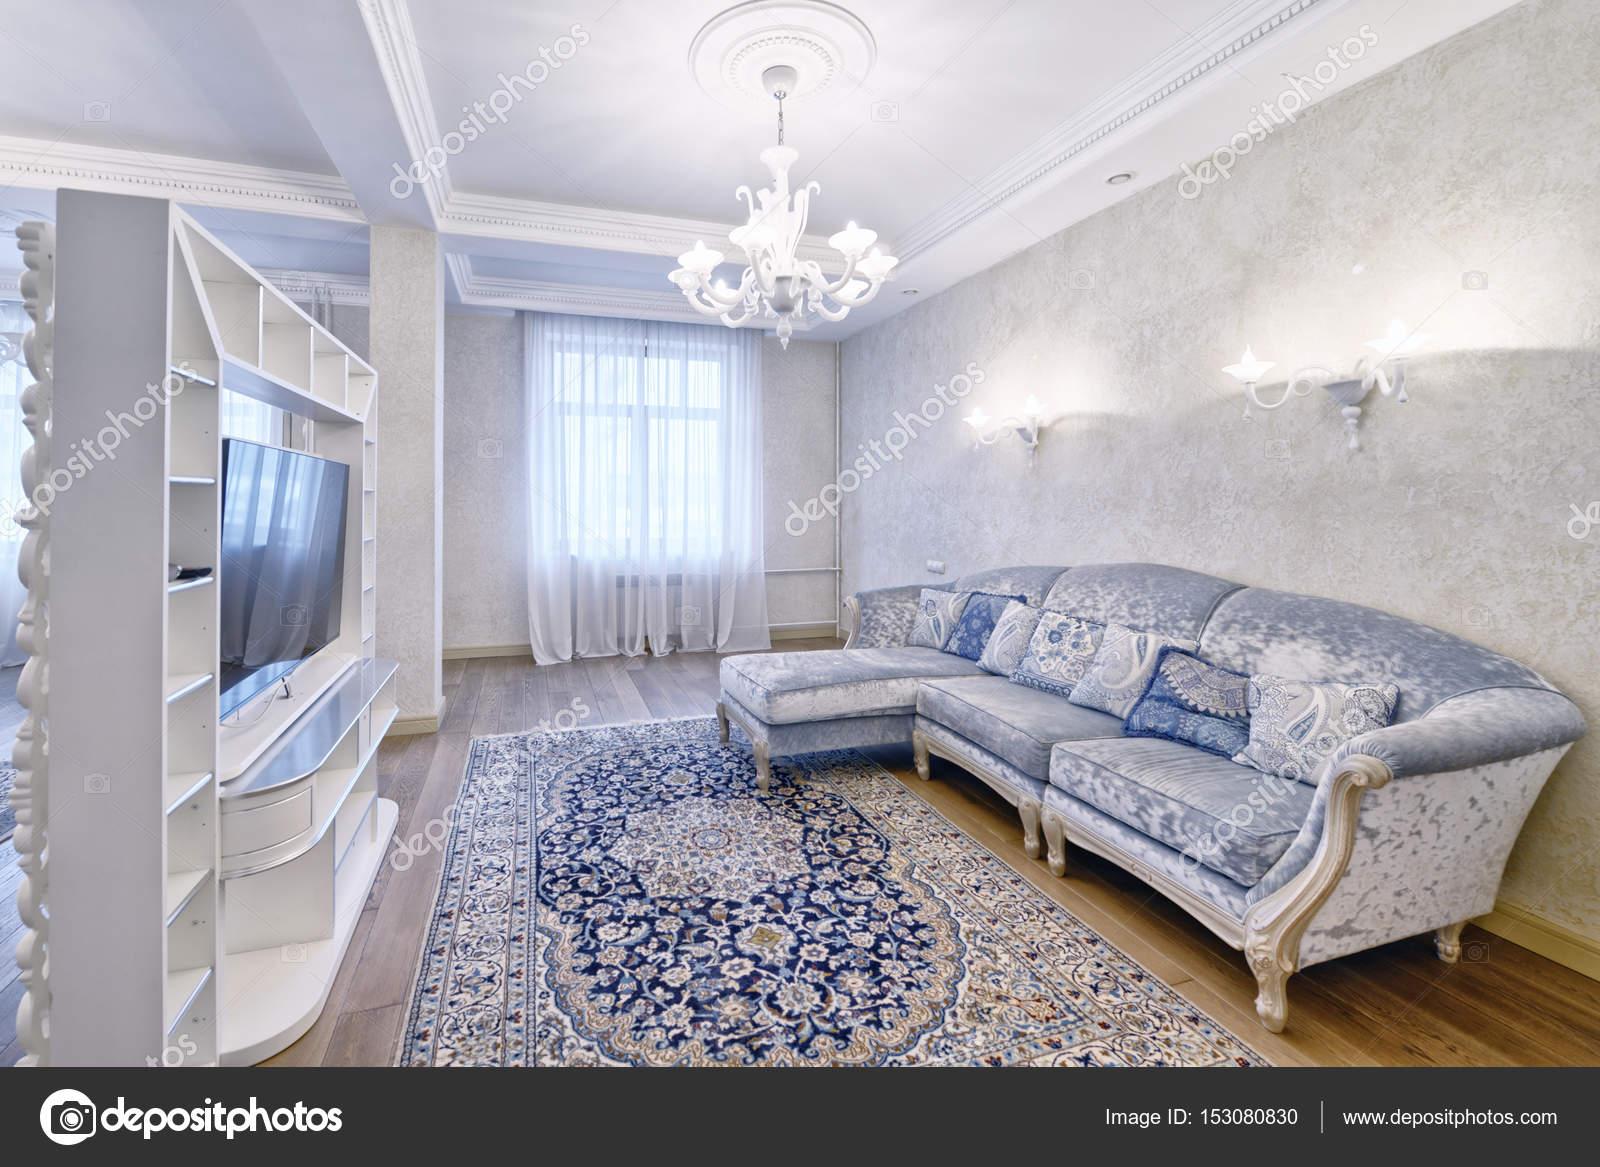 Rusland, Moscow region - interieur design-woonkamer in luxe nieuw ...